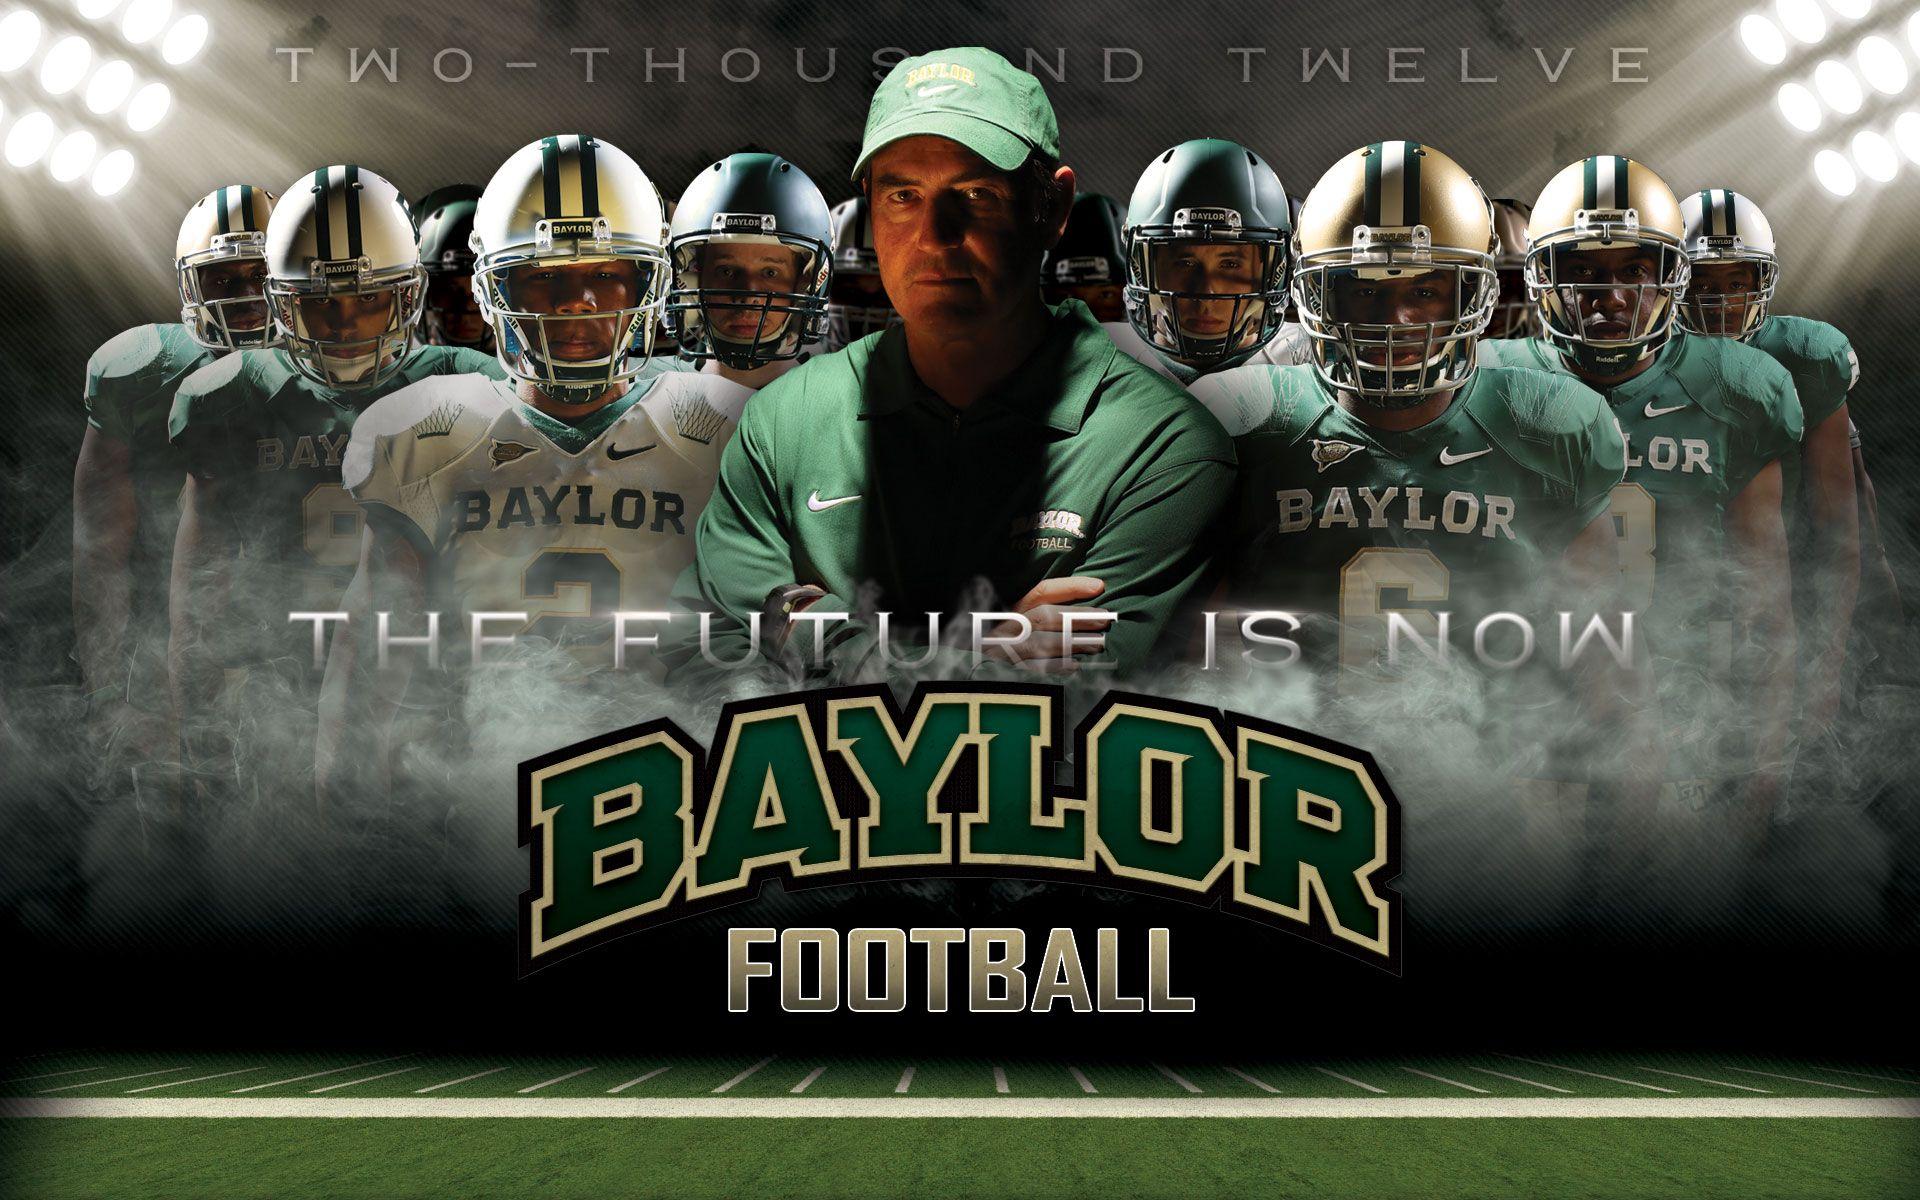 College Football Wallpaper